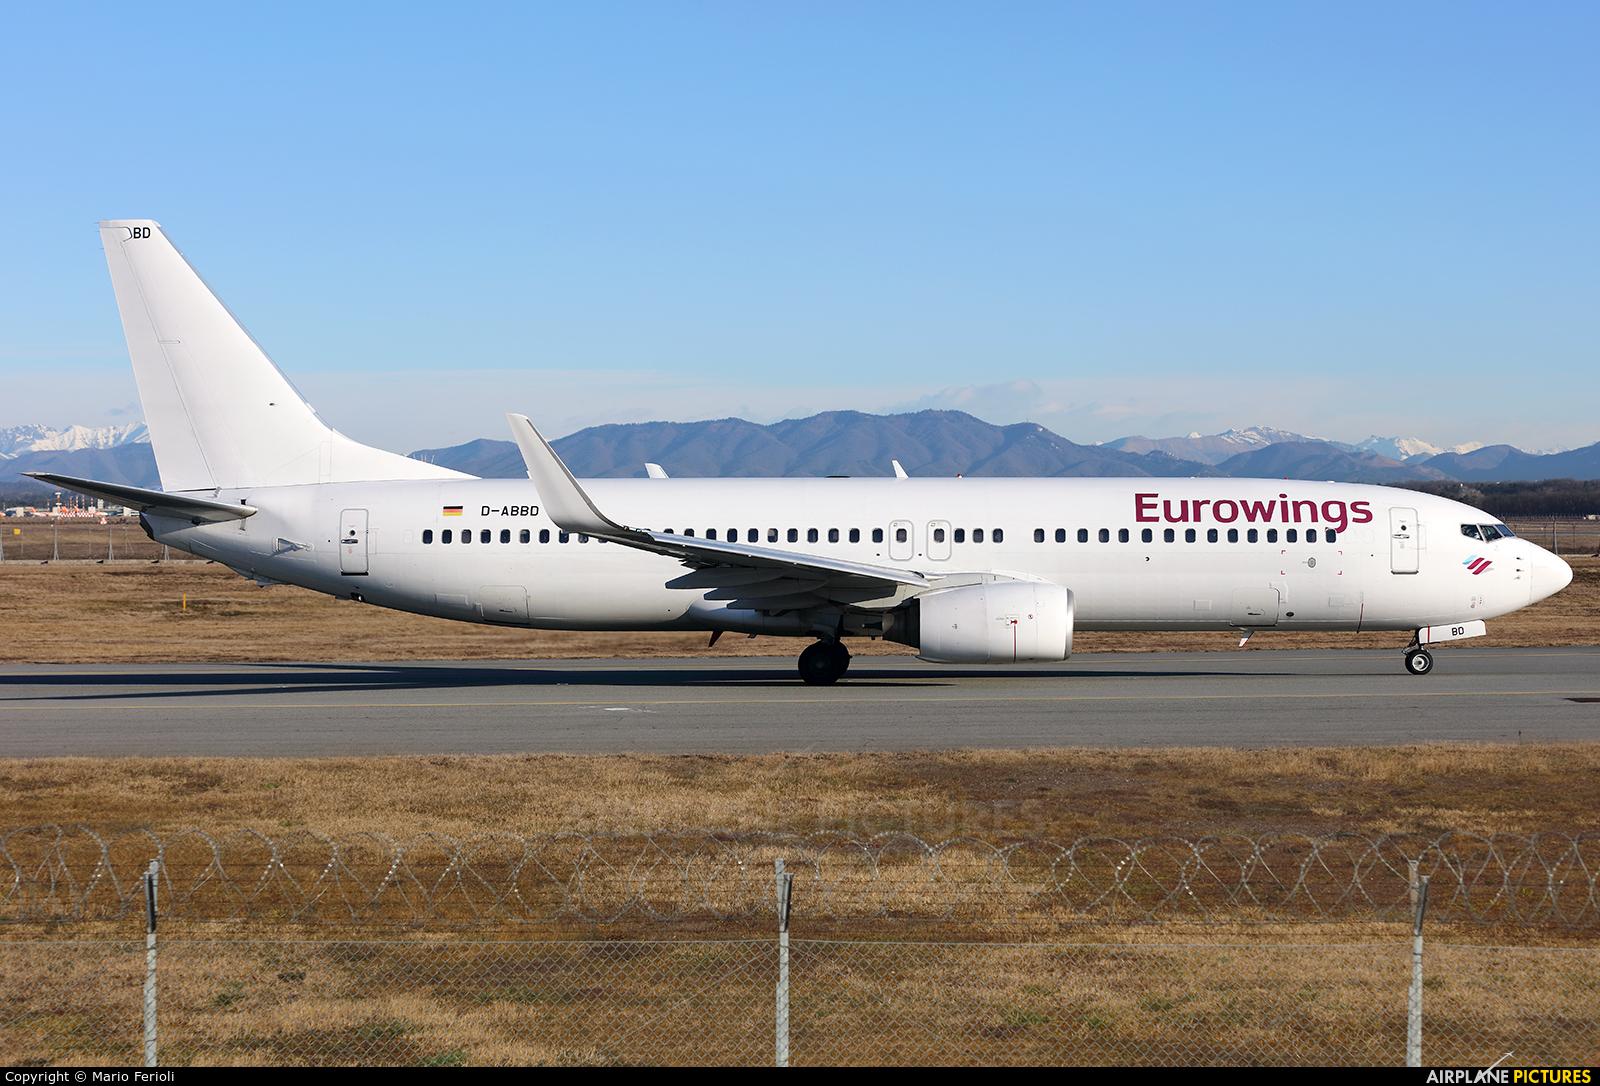 Eurowings D-ABBD aircraft at Milan - Malpensa